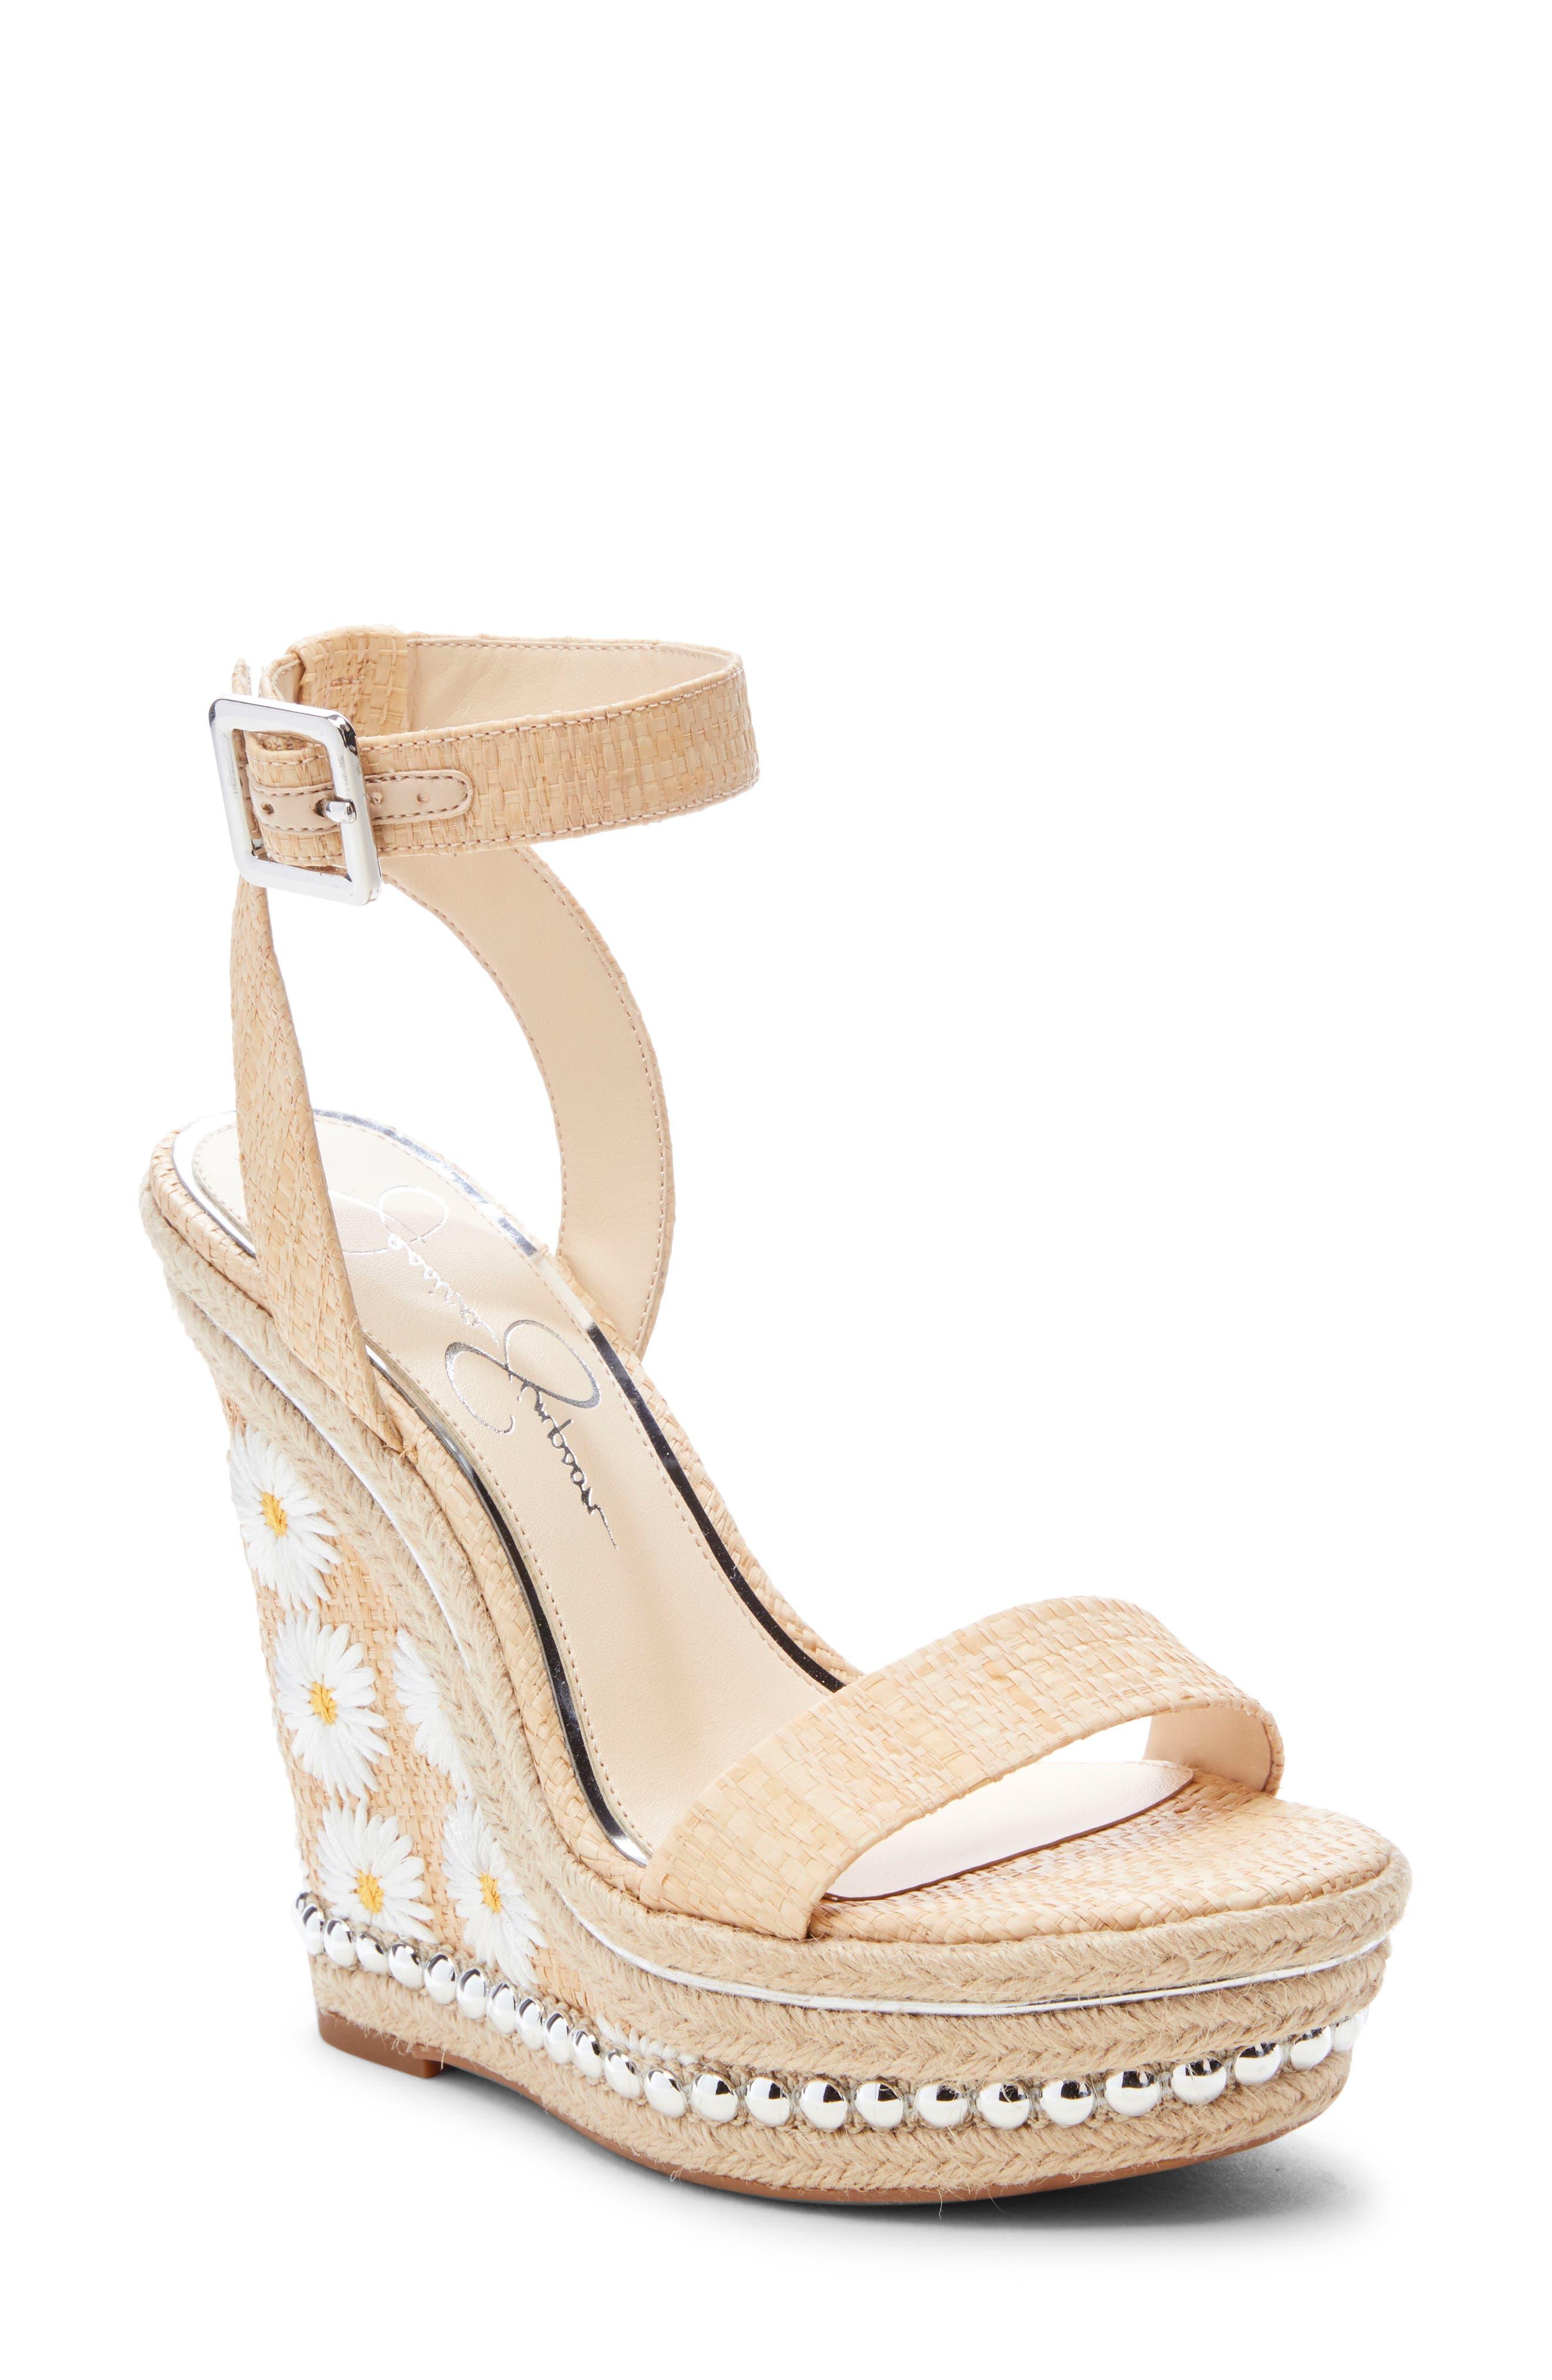 Jessica Simpson Alinda Embellished Wedge Sandal, Brown